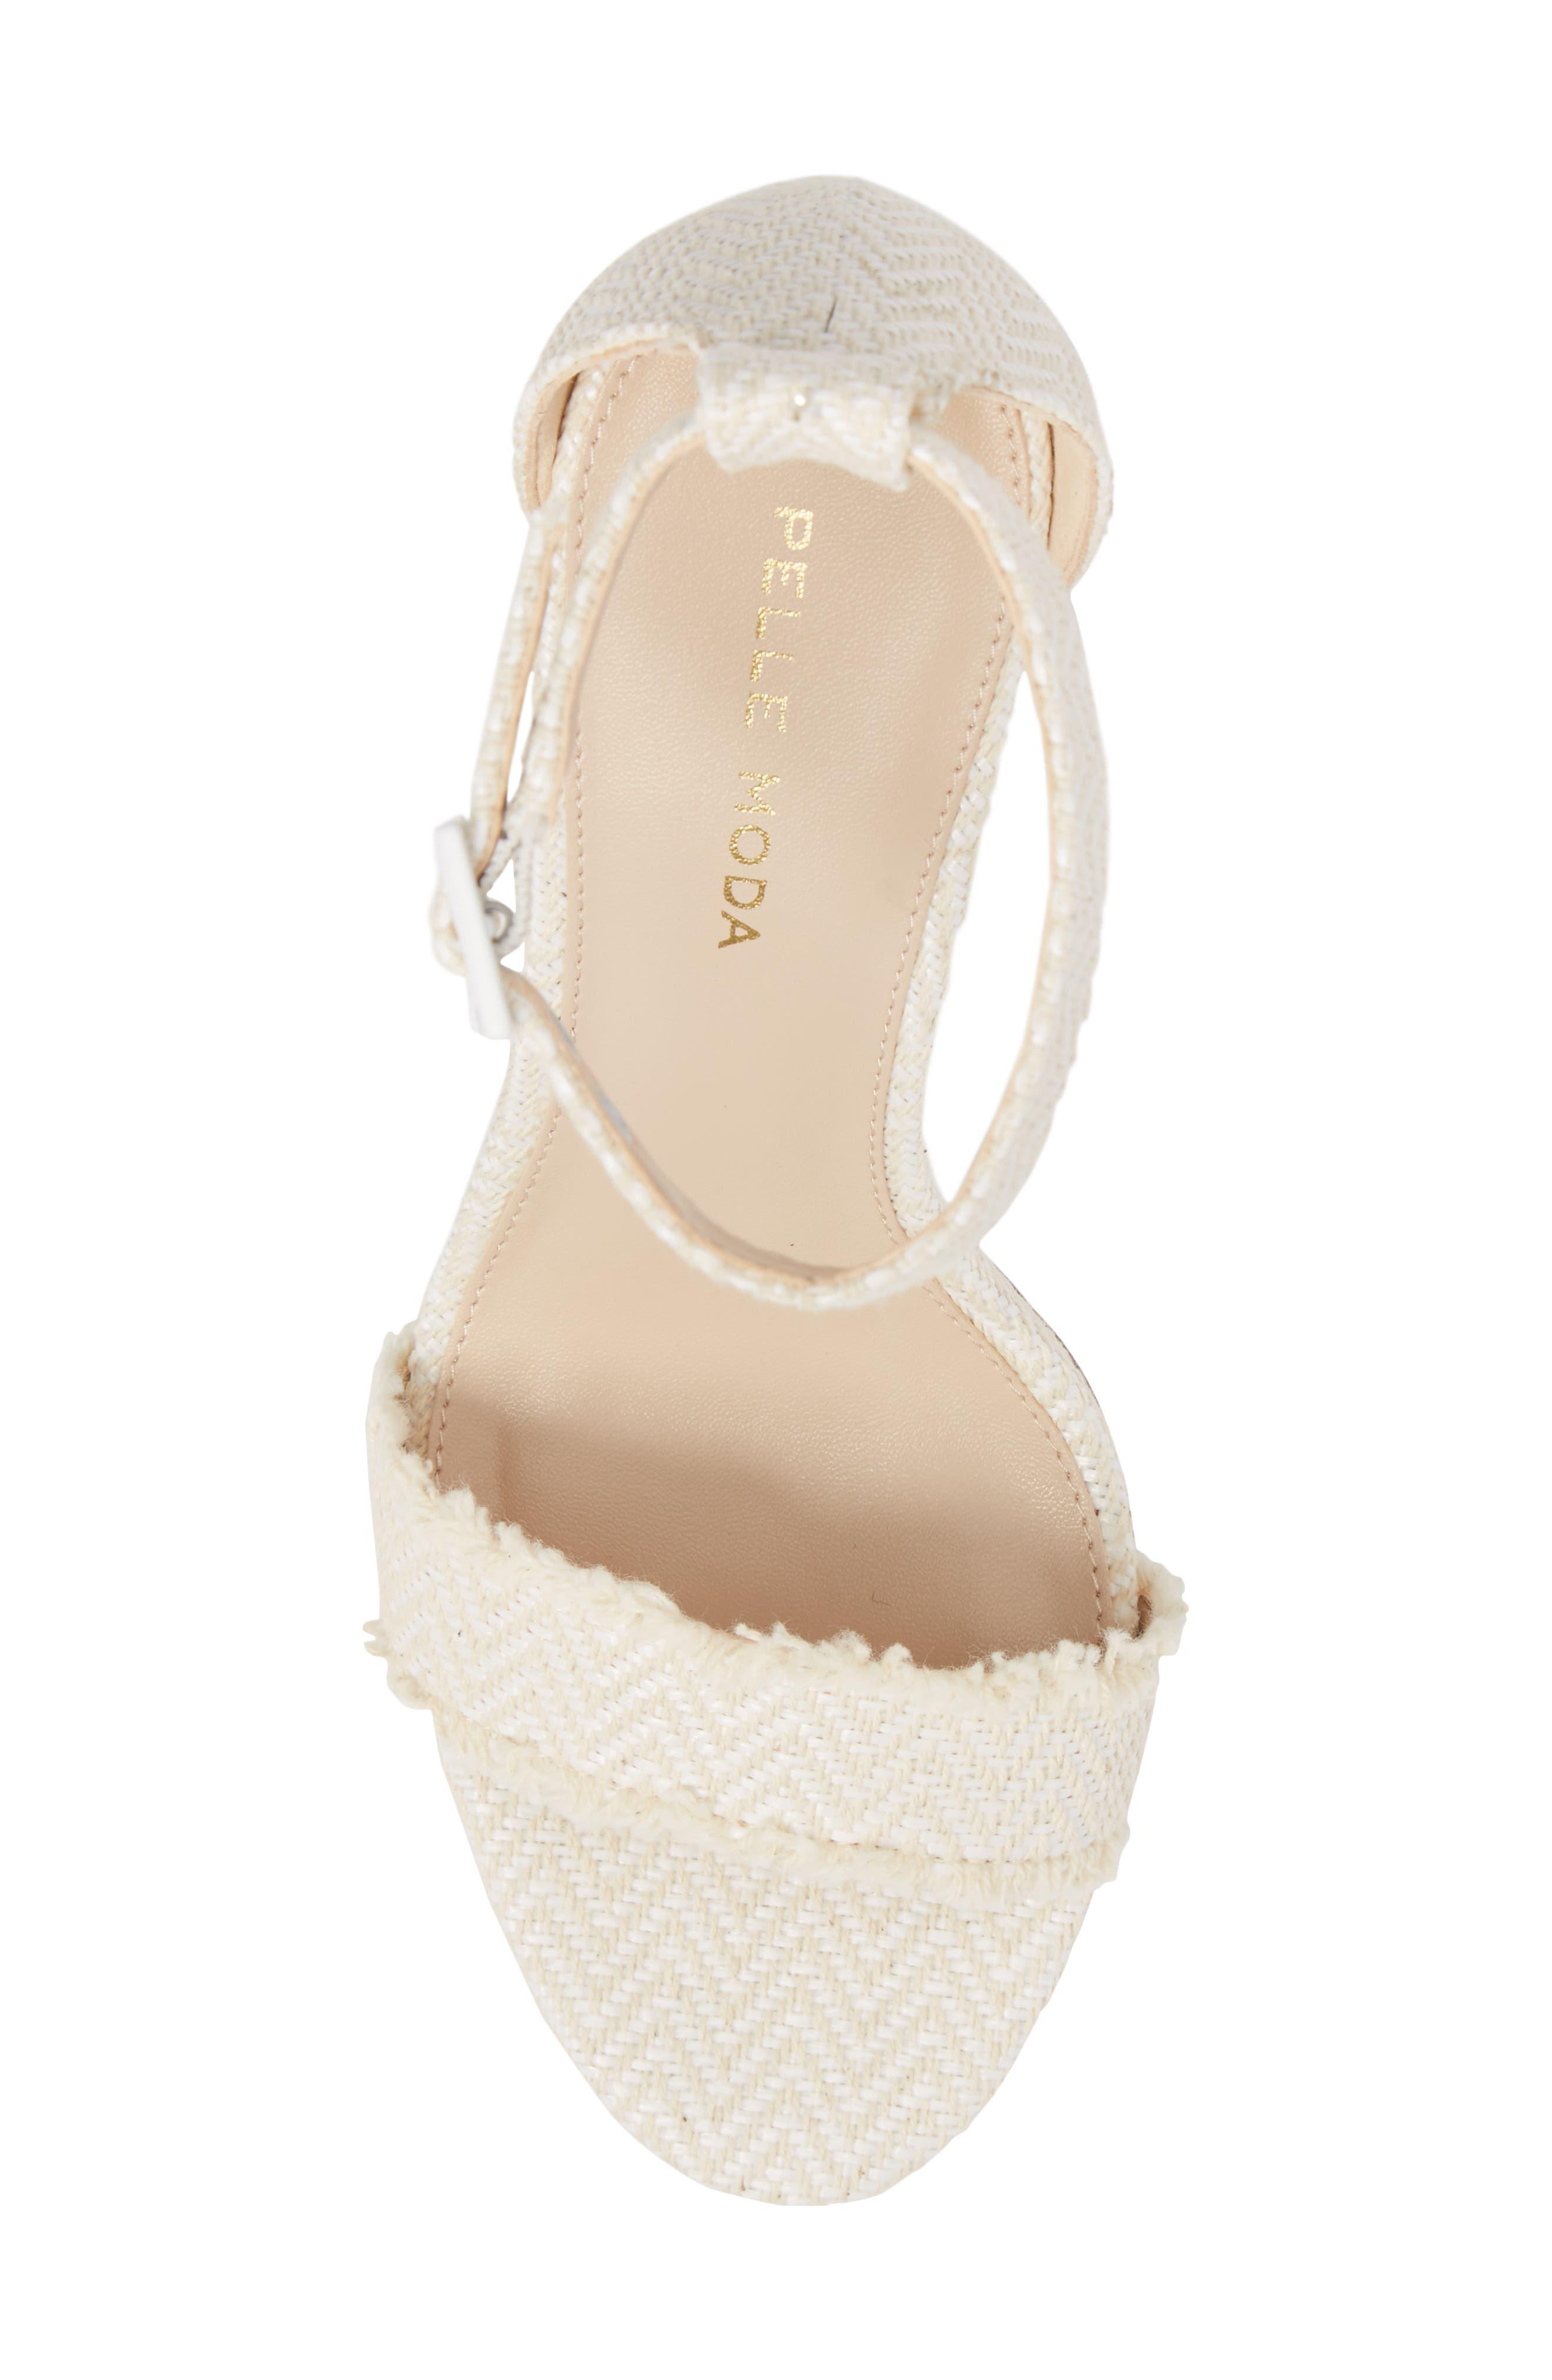 Bonnie Ankle Strap Sandal,                             Alternate thumbnail 5, color,                             White Herringbone